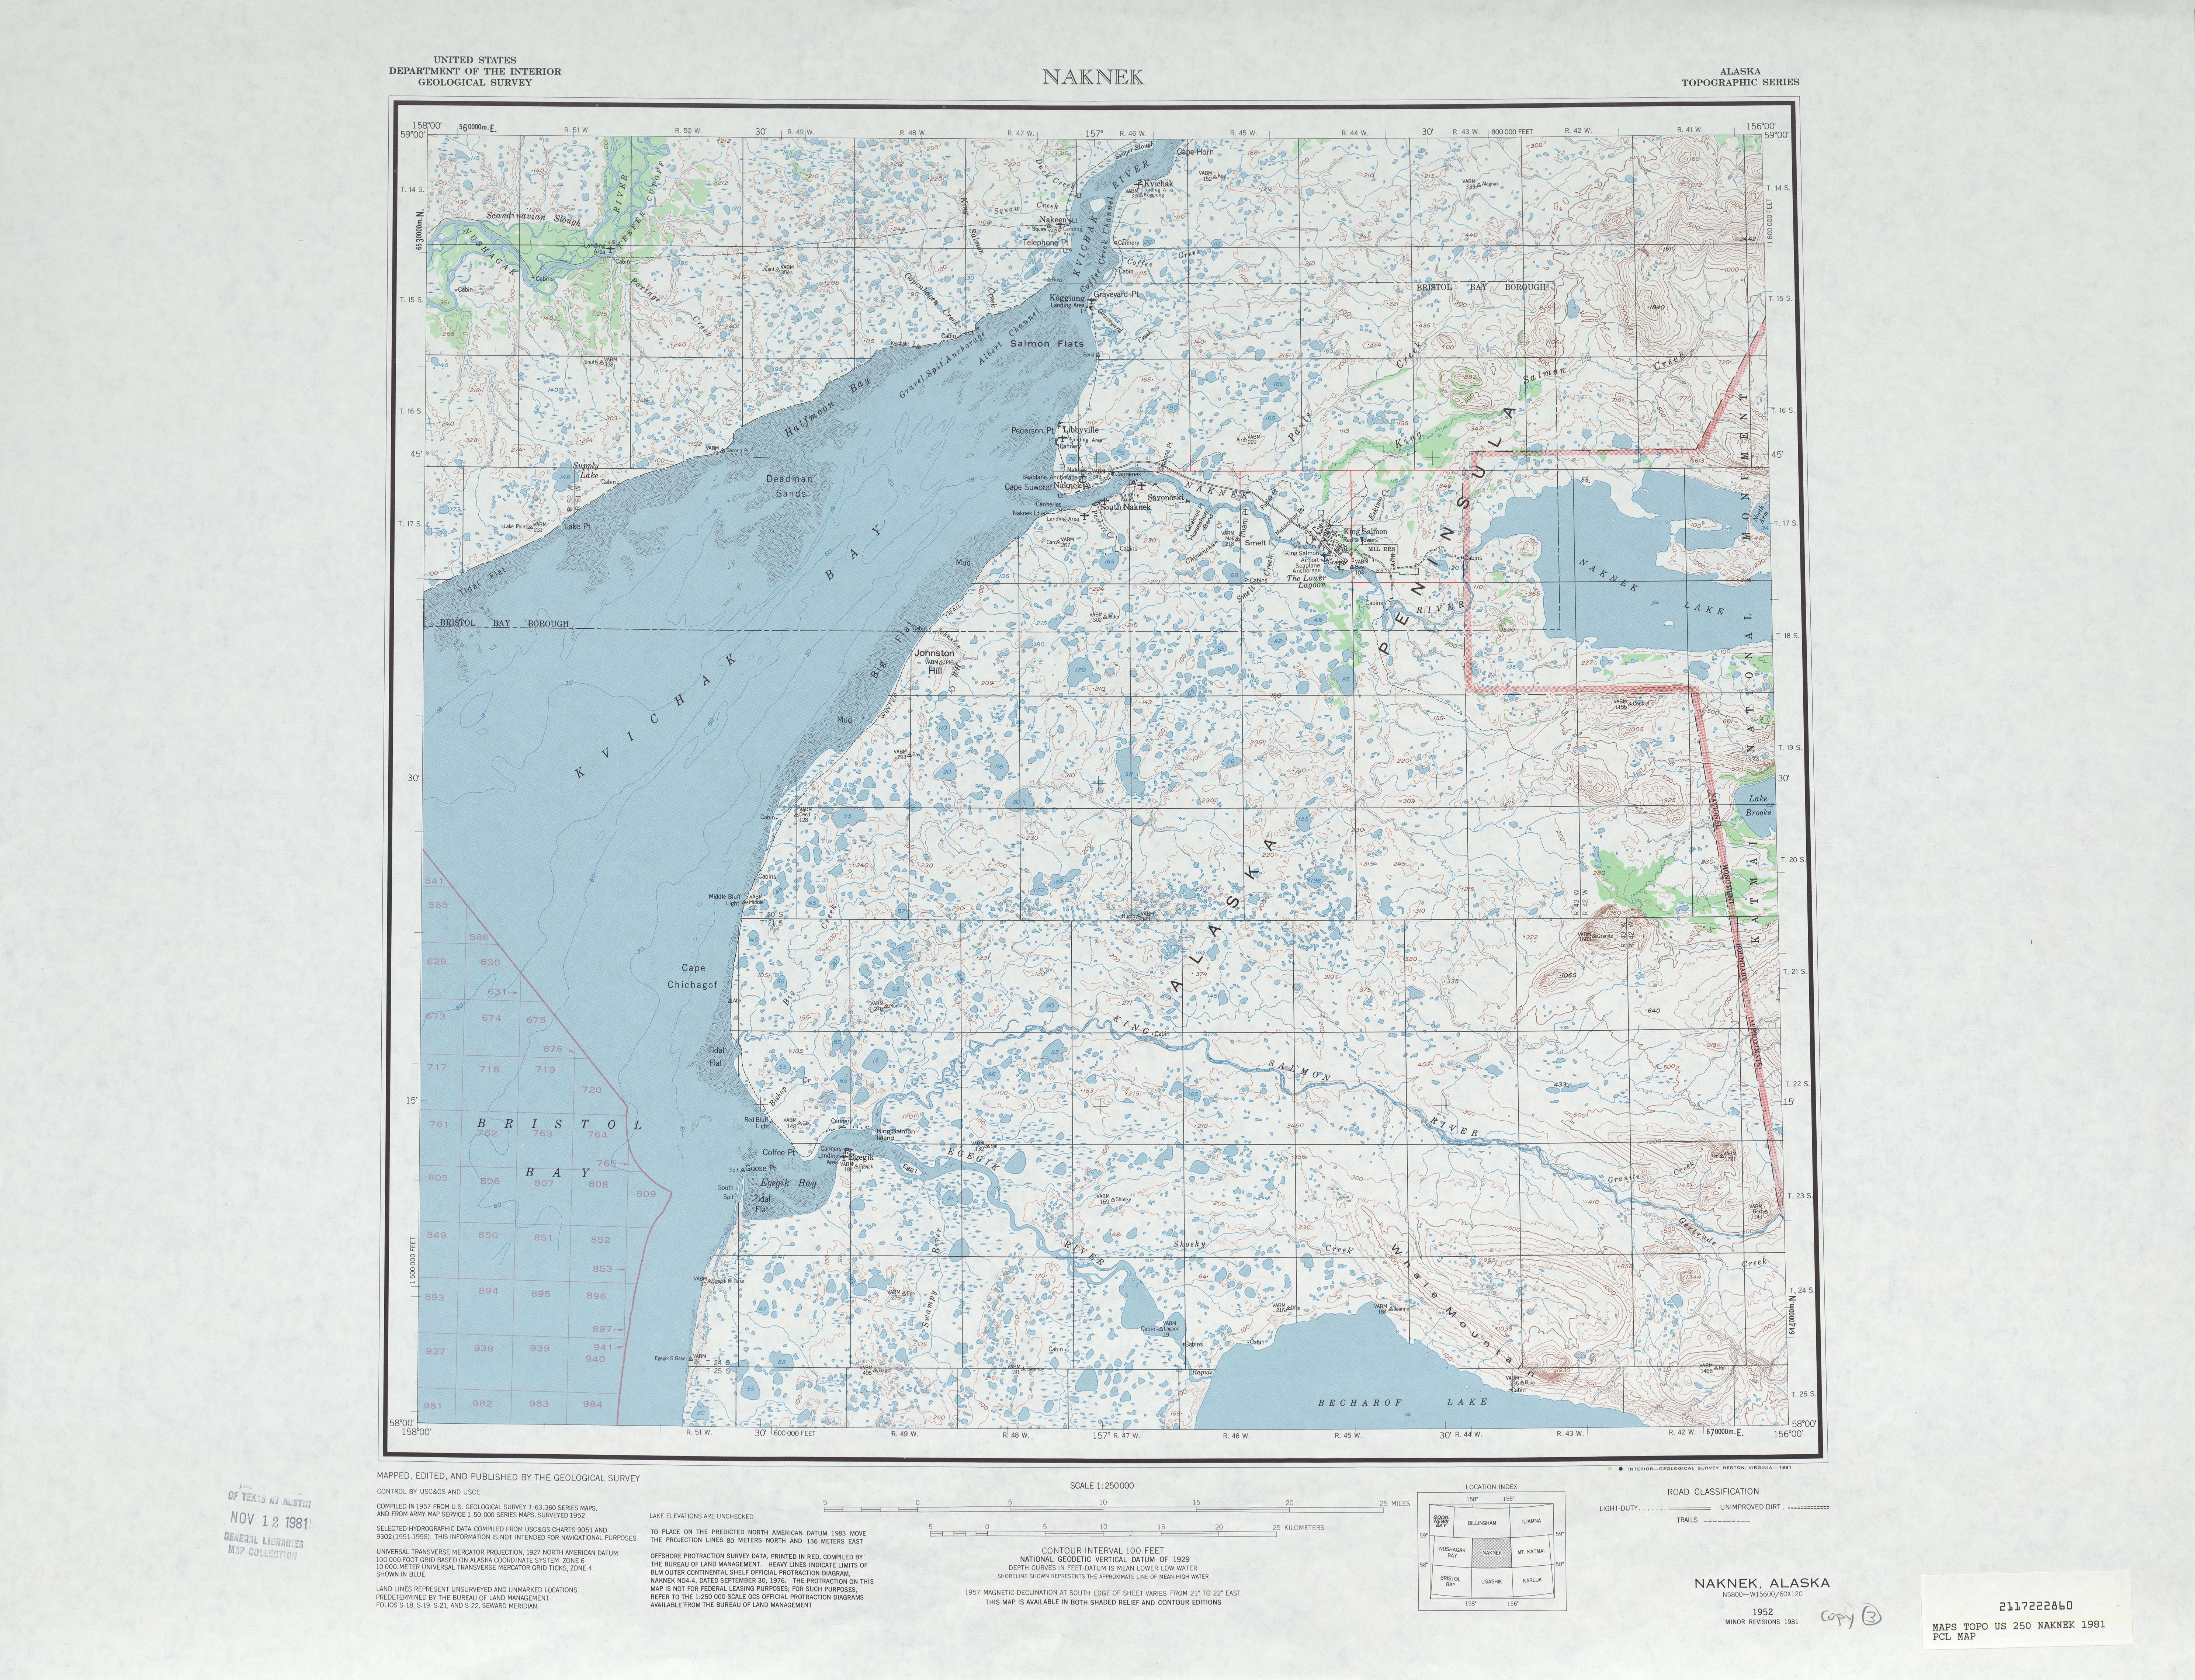 Naknek Topographic Map Sheet, United States